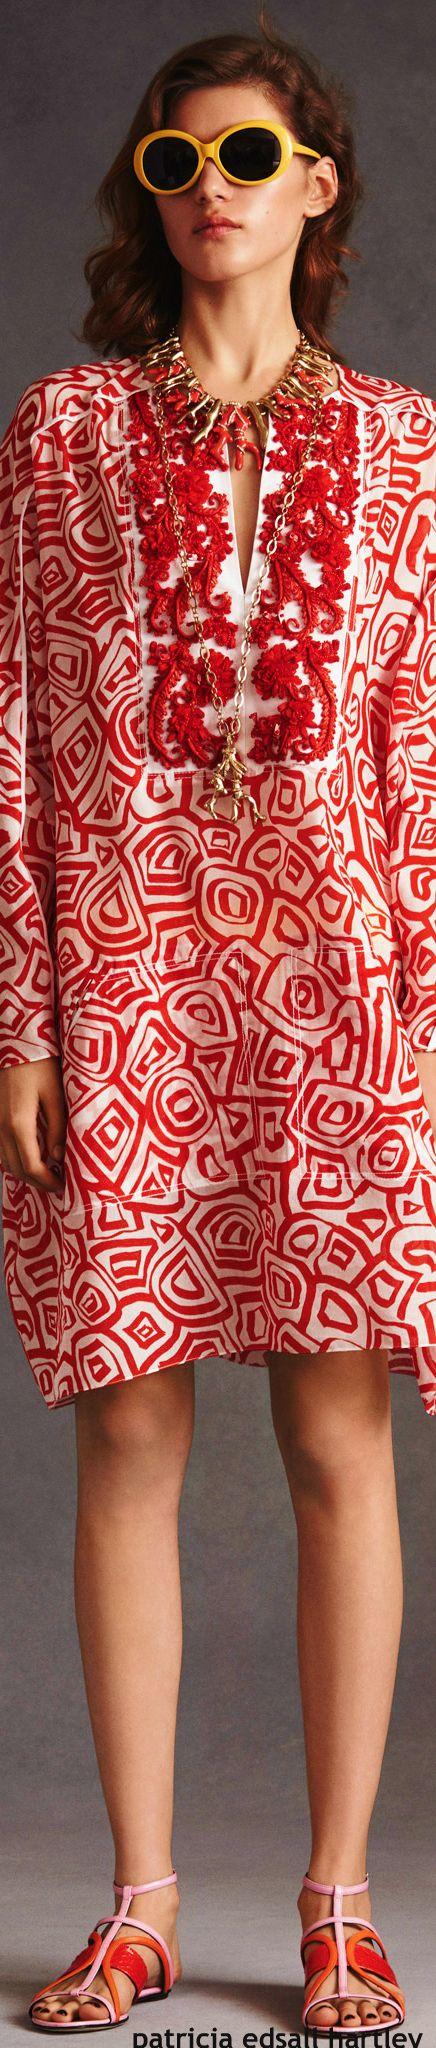 Love oscar de la renta's work, this dress is especially unique, a real work of art.